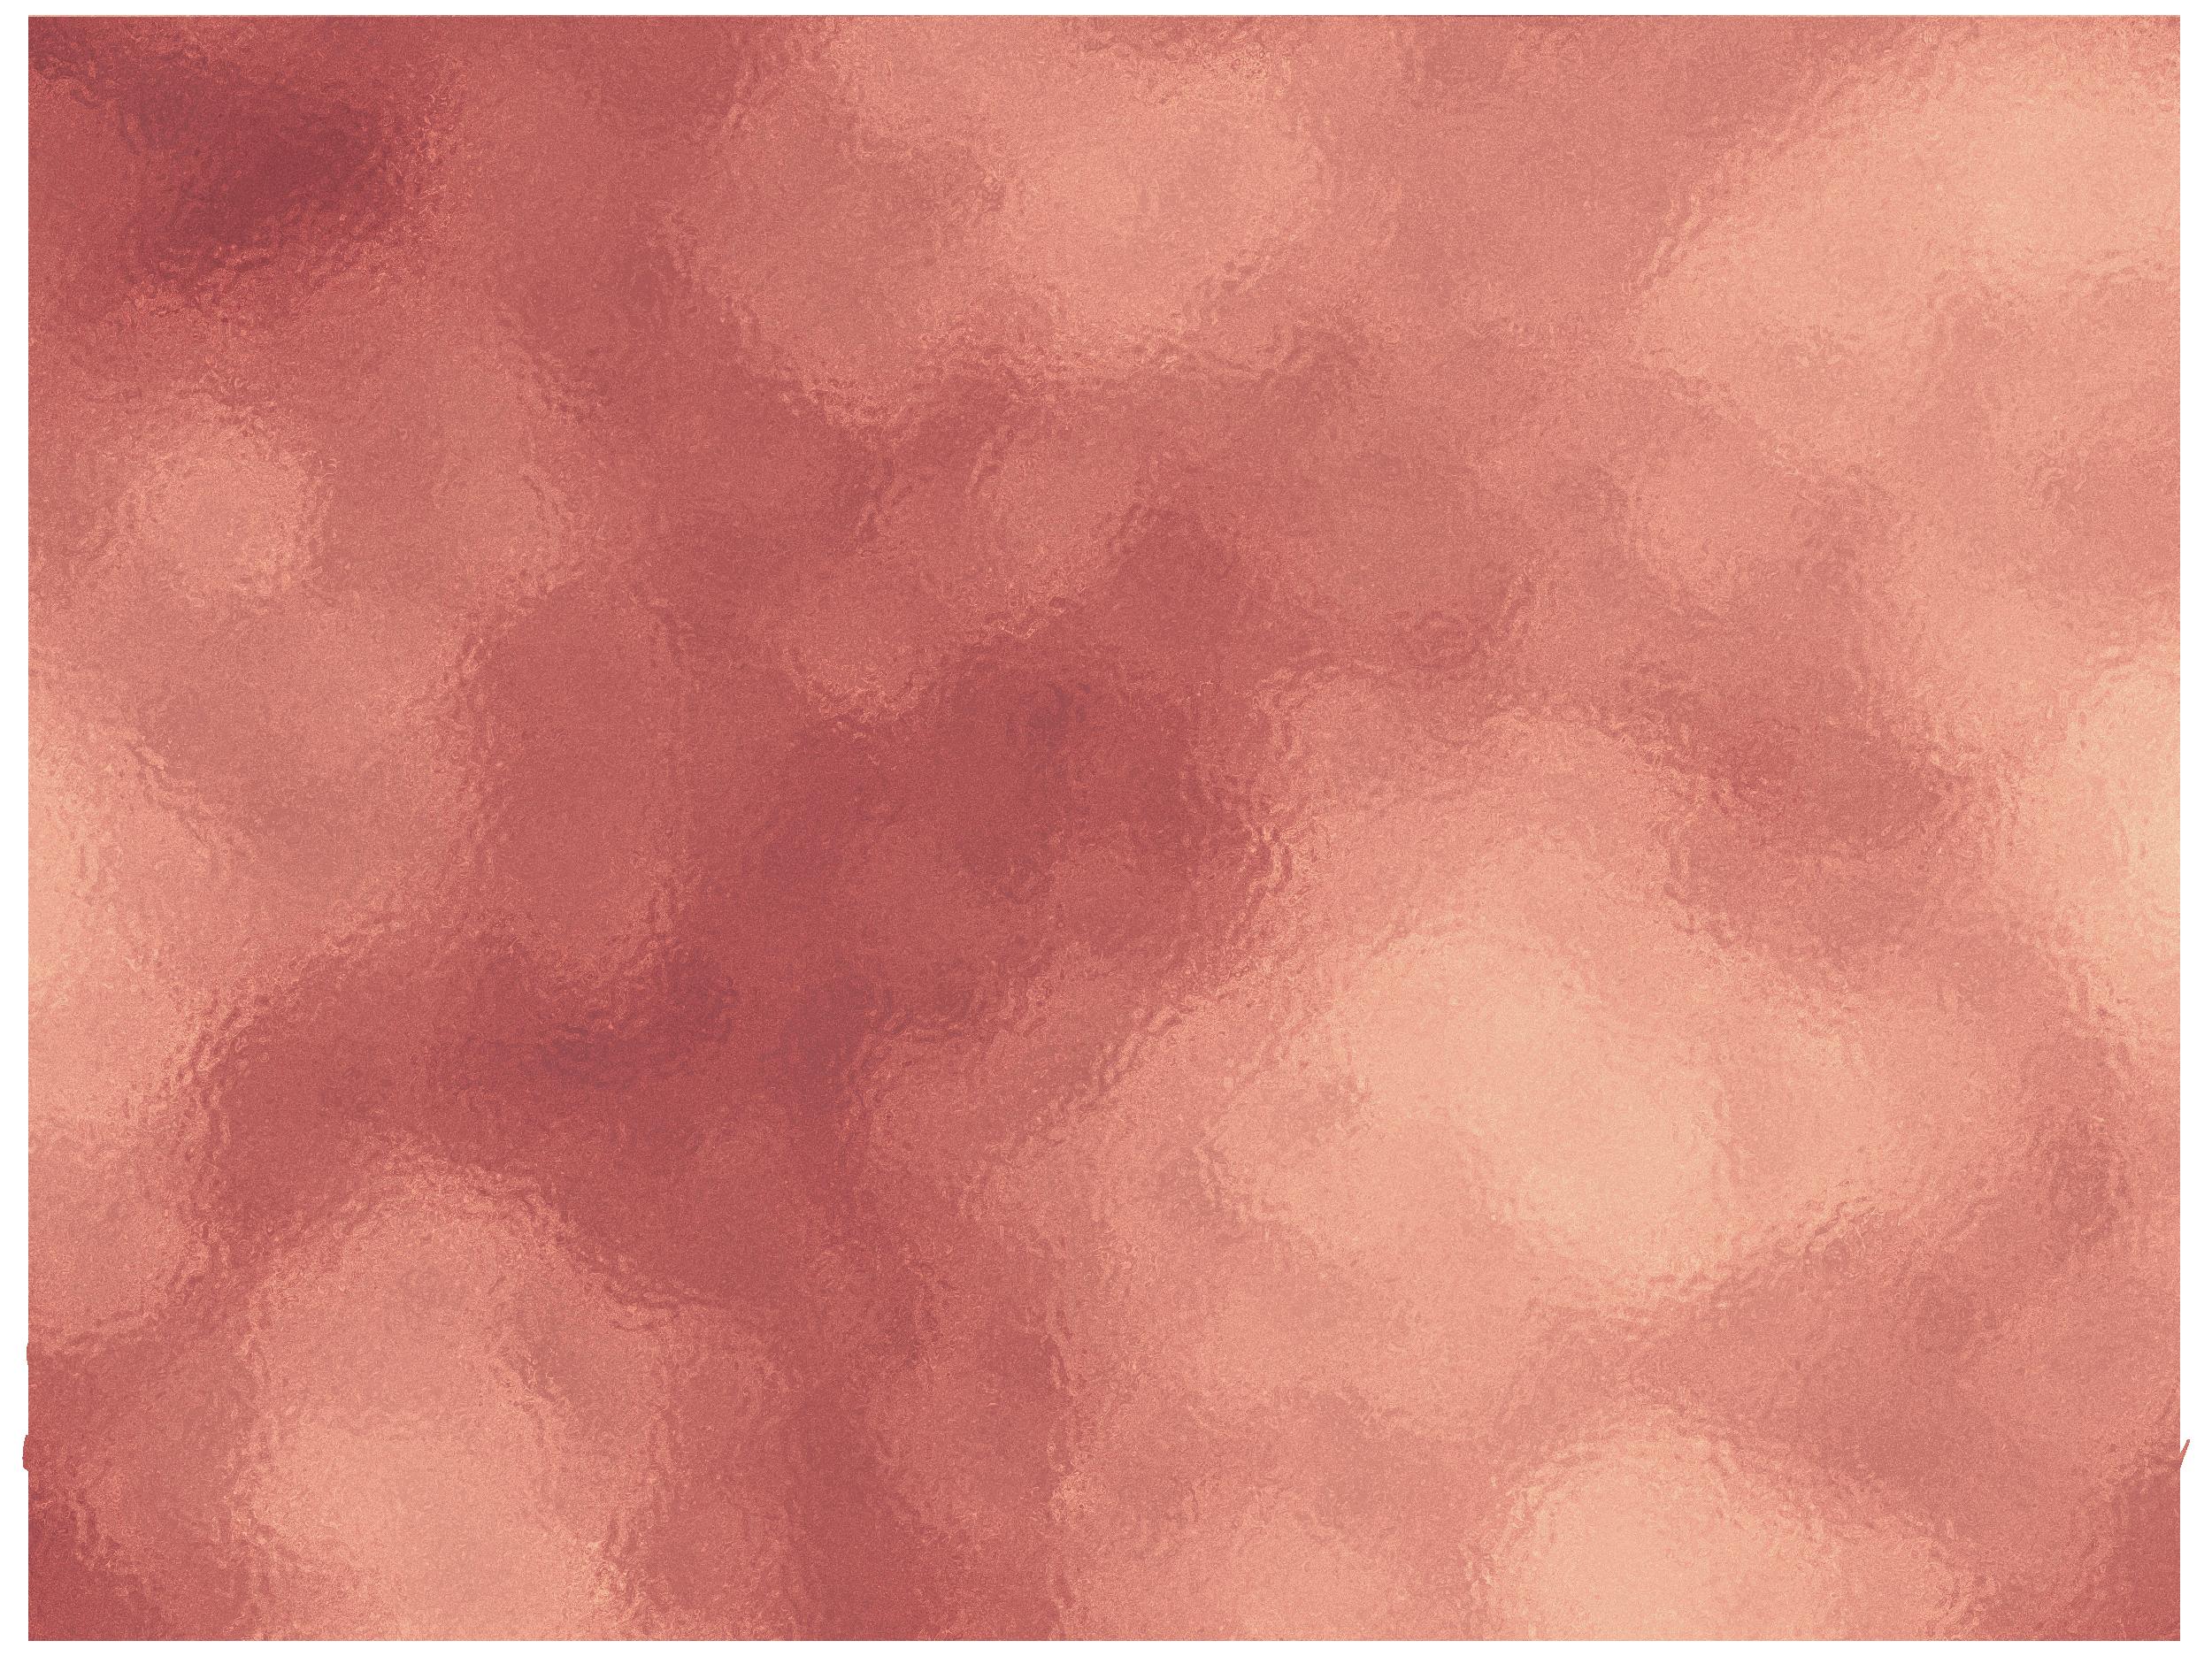 Samantha Bell Photography